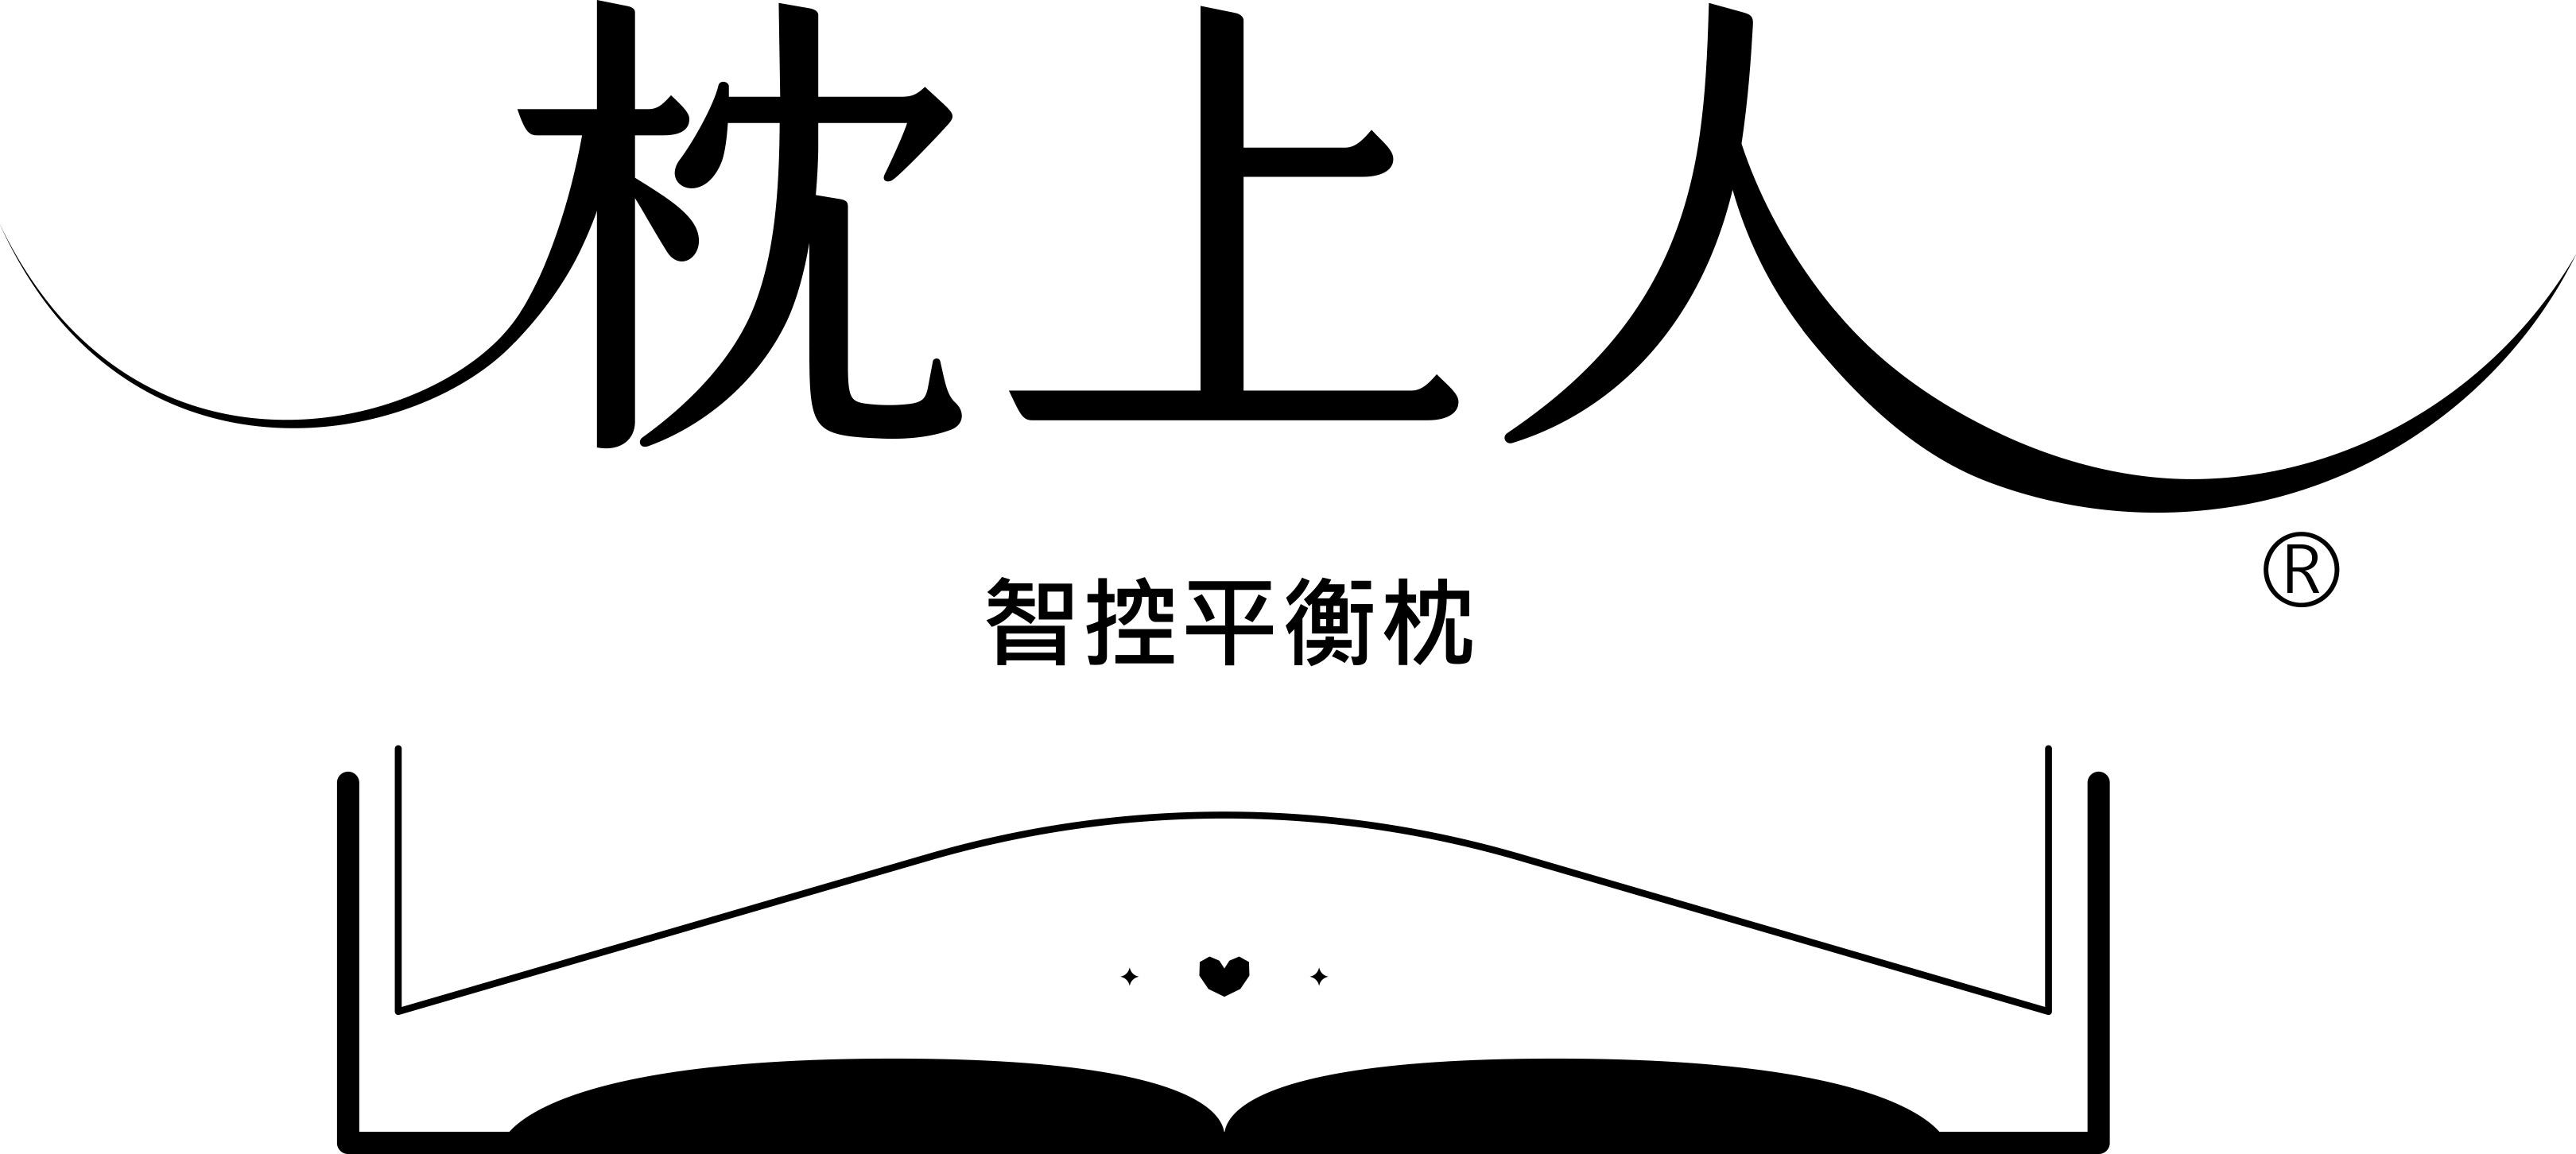 KUONAO CO., LTD.-Logo